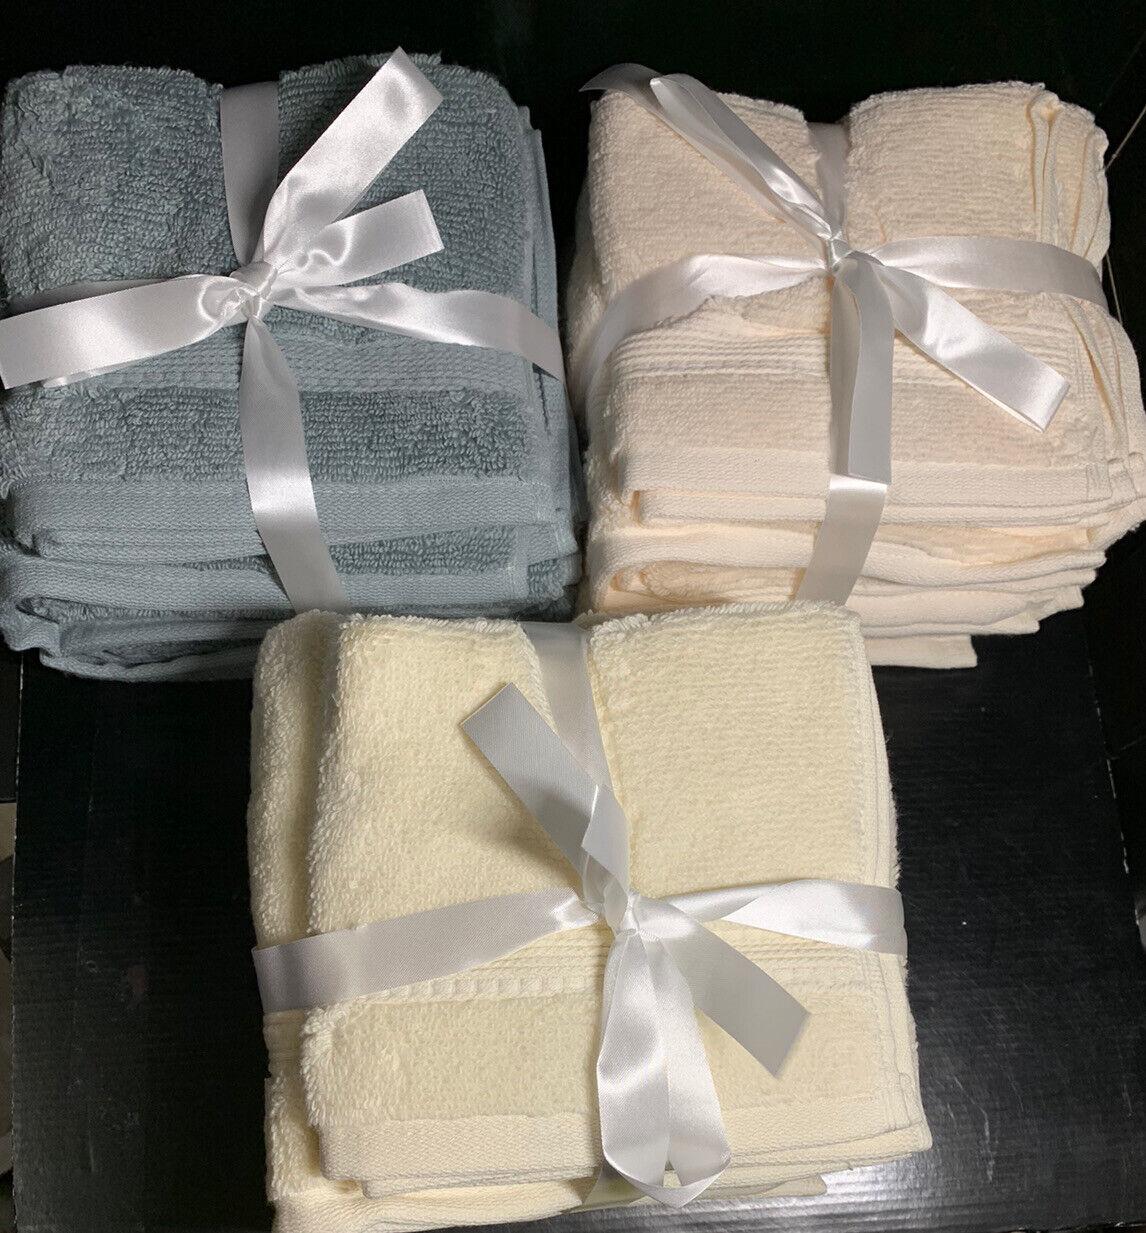 Charisma Soft 100% HygroCotton 4pk Hand &Washcloth Towel Set Aloe Ivory Sunlight